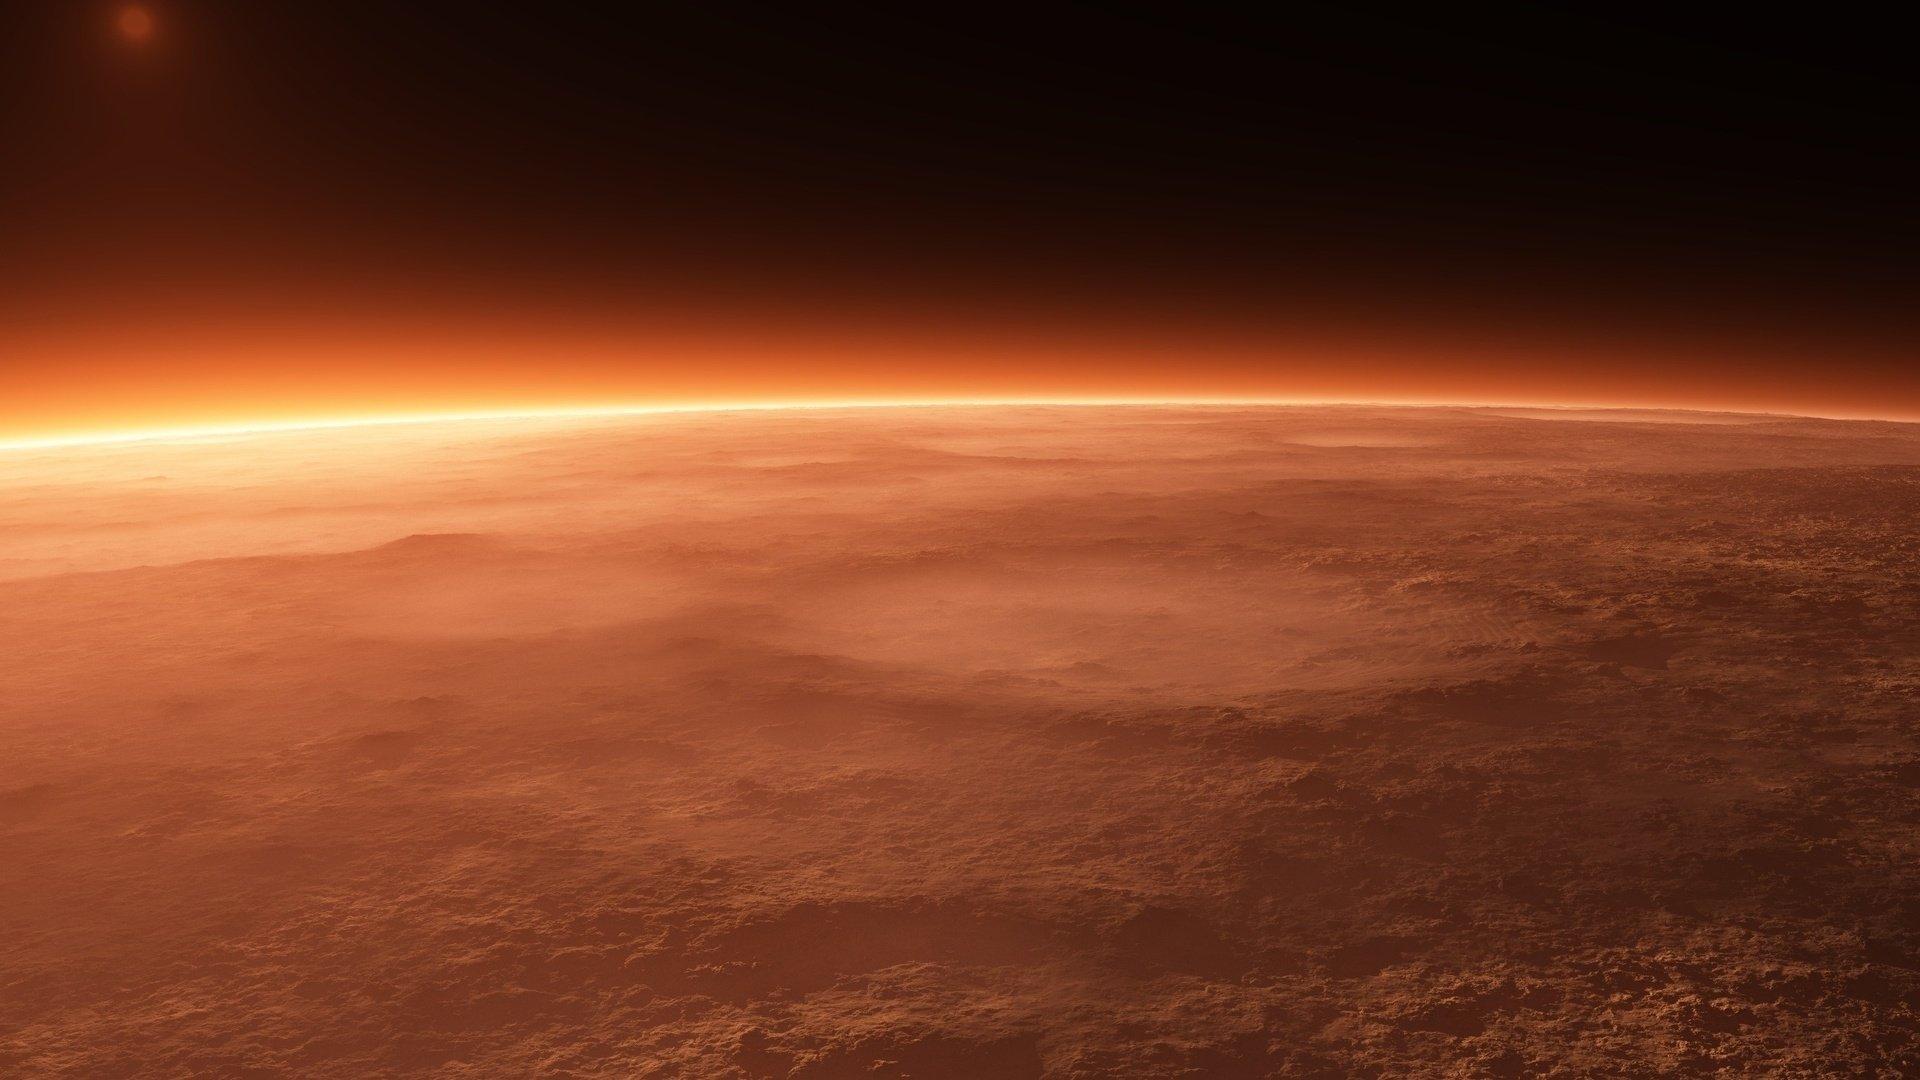 Mars Wallpaper Download